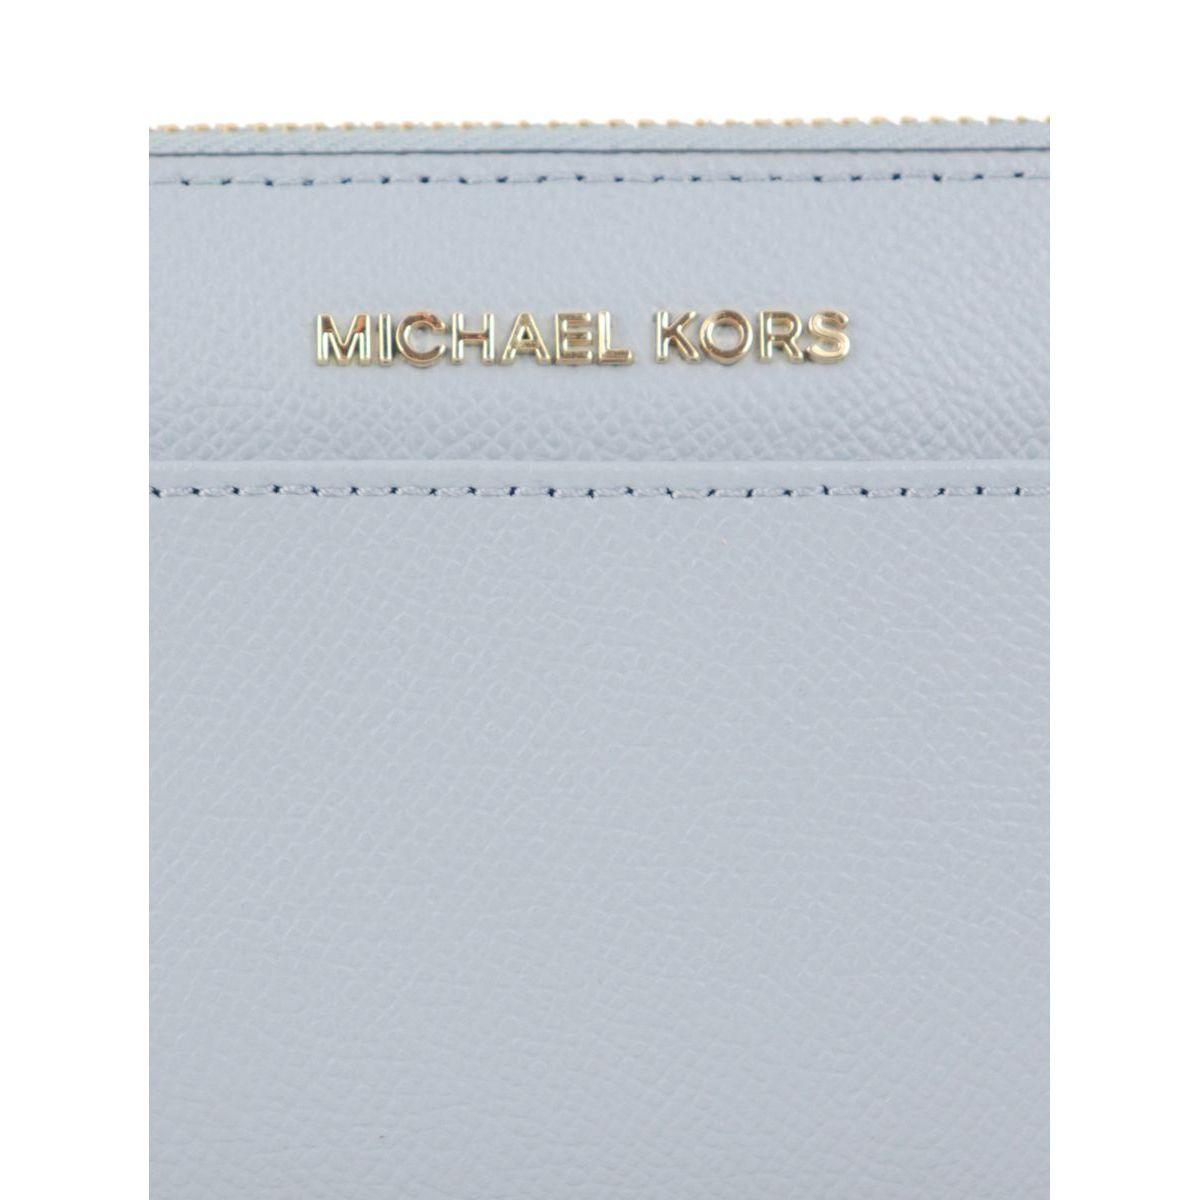 CONTINENTAL JET SET wallet in leather Light blue Michael Kors